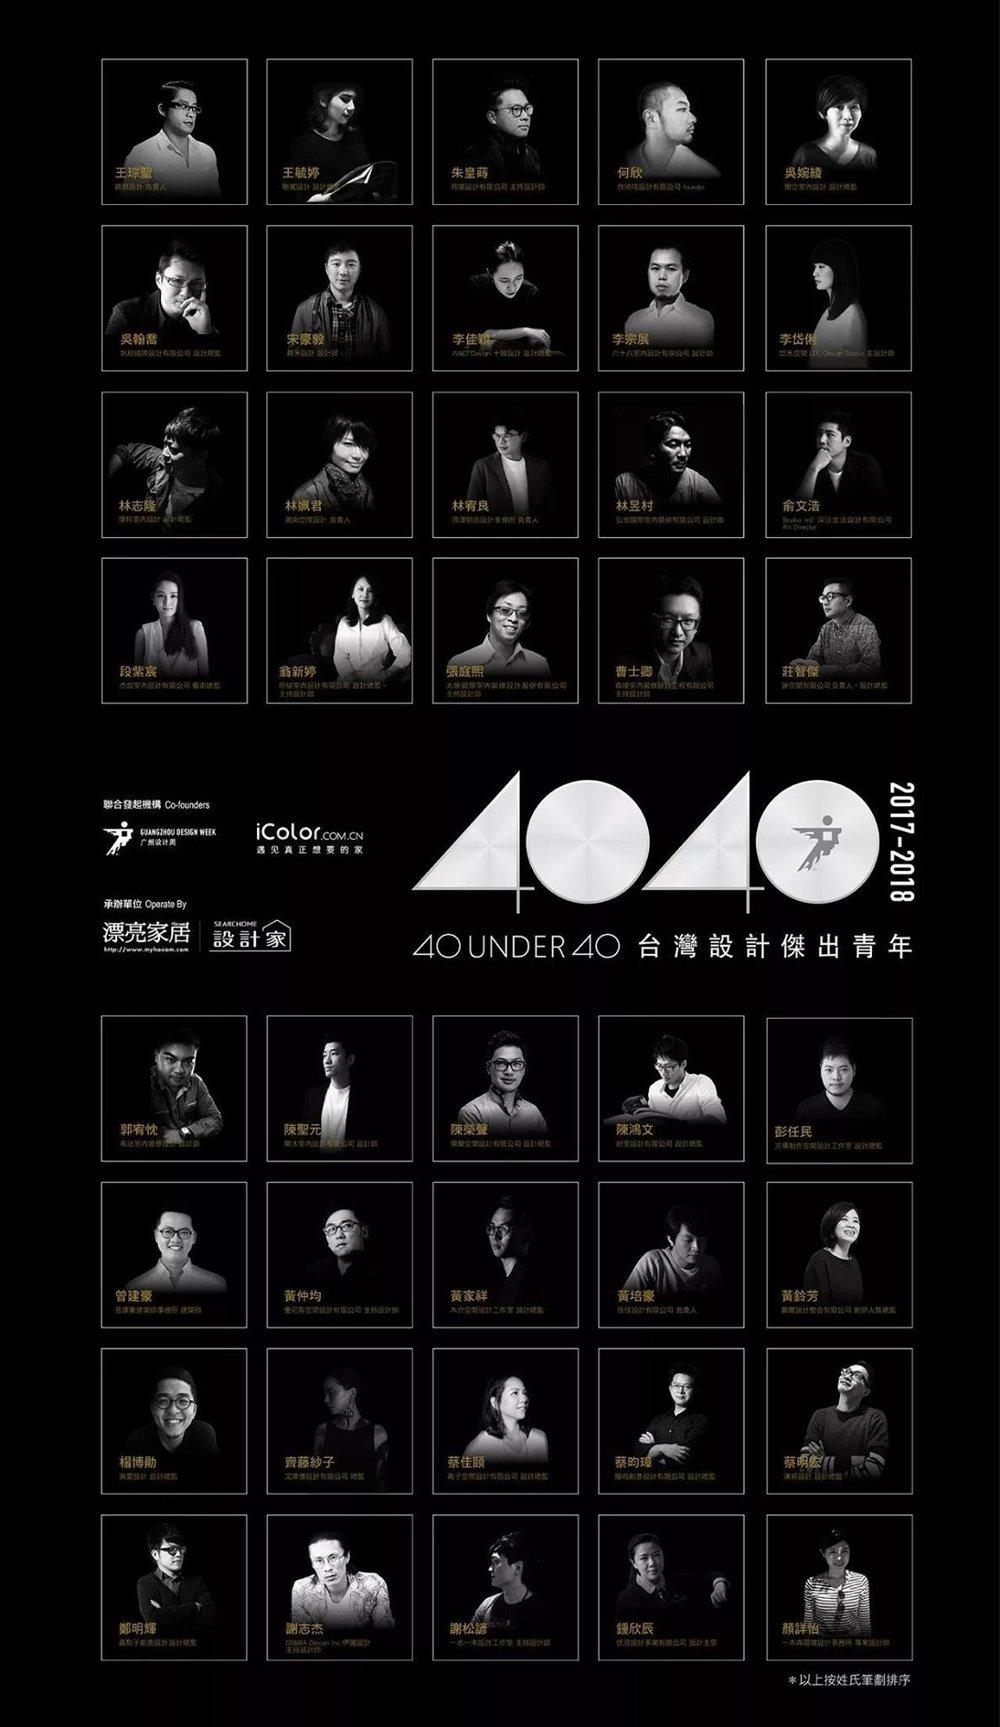 - 2017-2018 GuangZhou Design Week40 Under 40 Taiwan Youth Designer2017- 2018 廣州設計週40 Under 40 台灣設計傑出青年